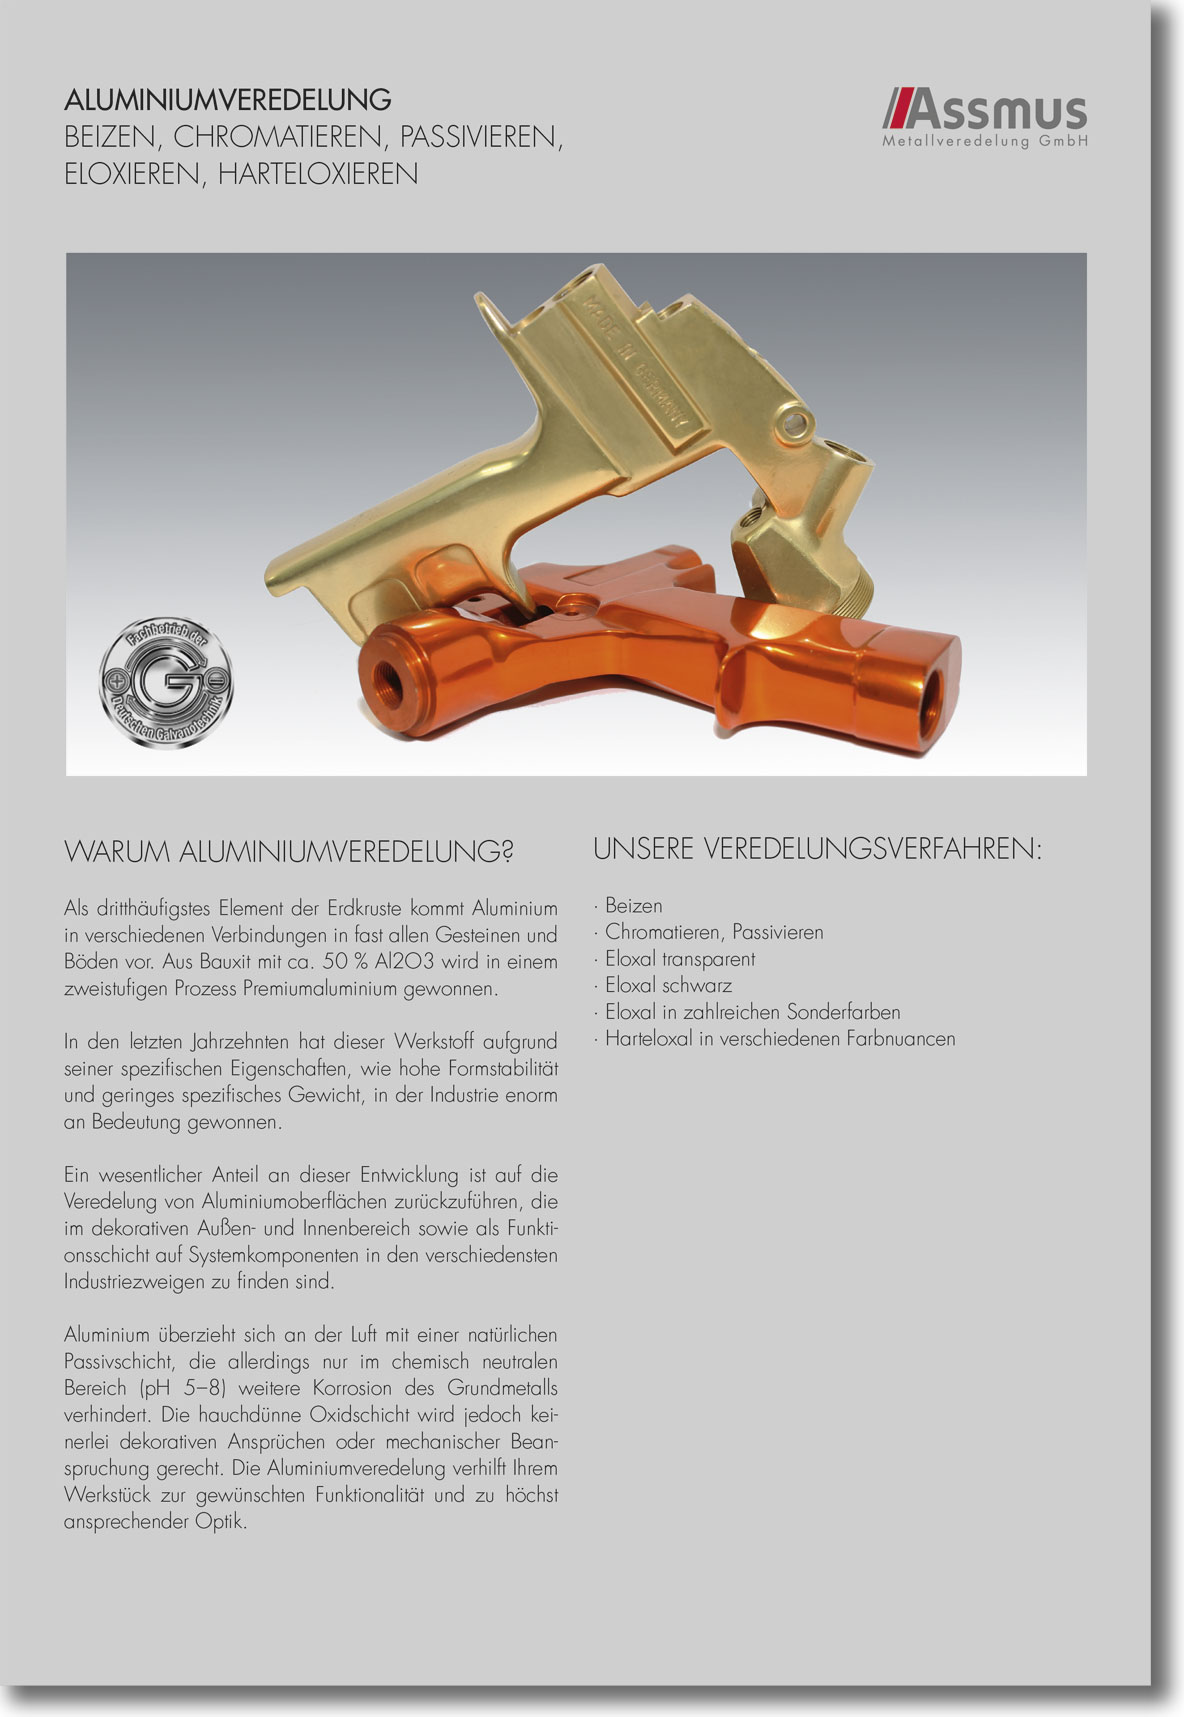 Extrem Aluminiumveredelung › Assmus Metallveredelung SI81